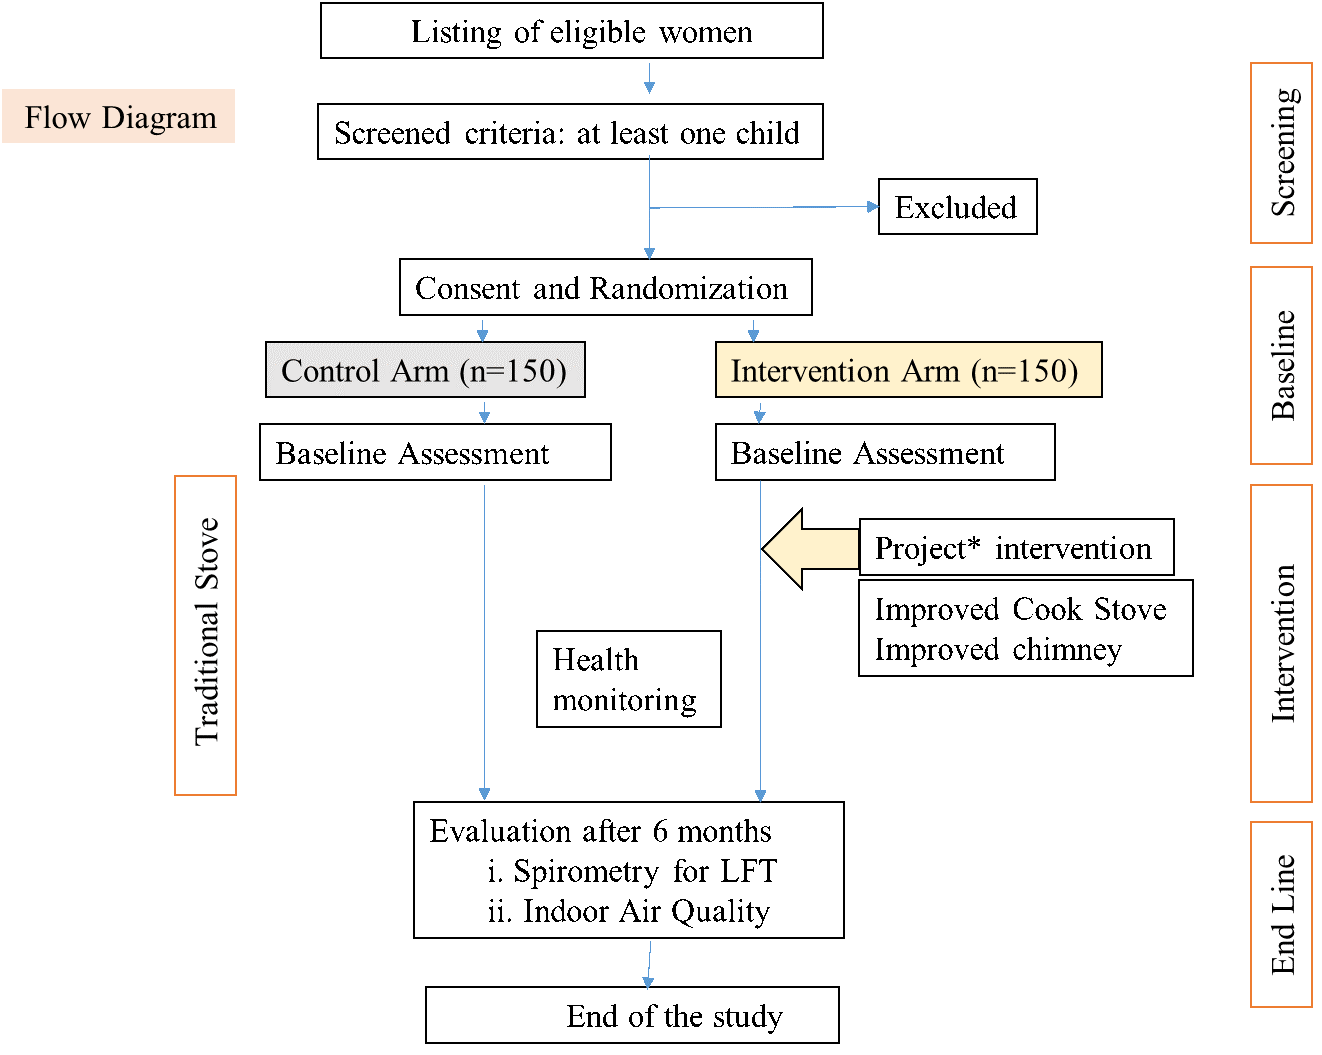 Figure 1. <b>Quasi-Experimental Design of the Study Flow</b>